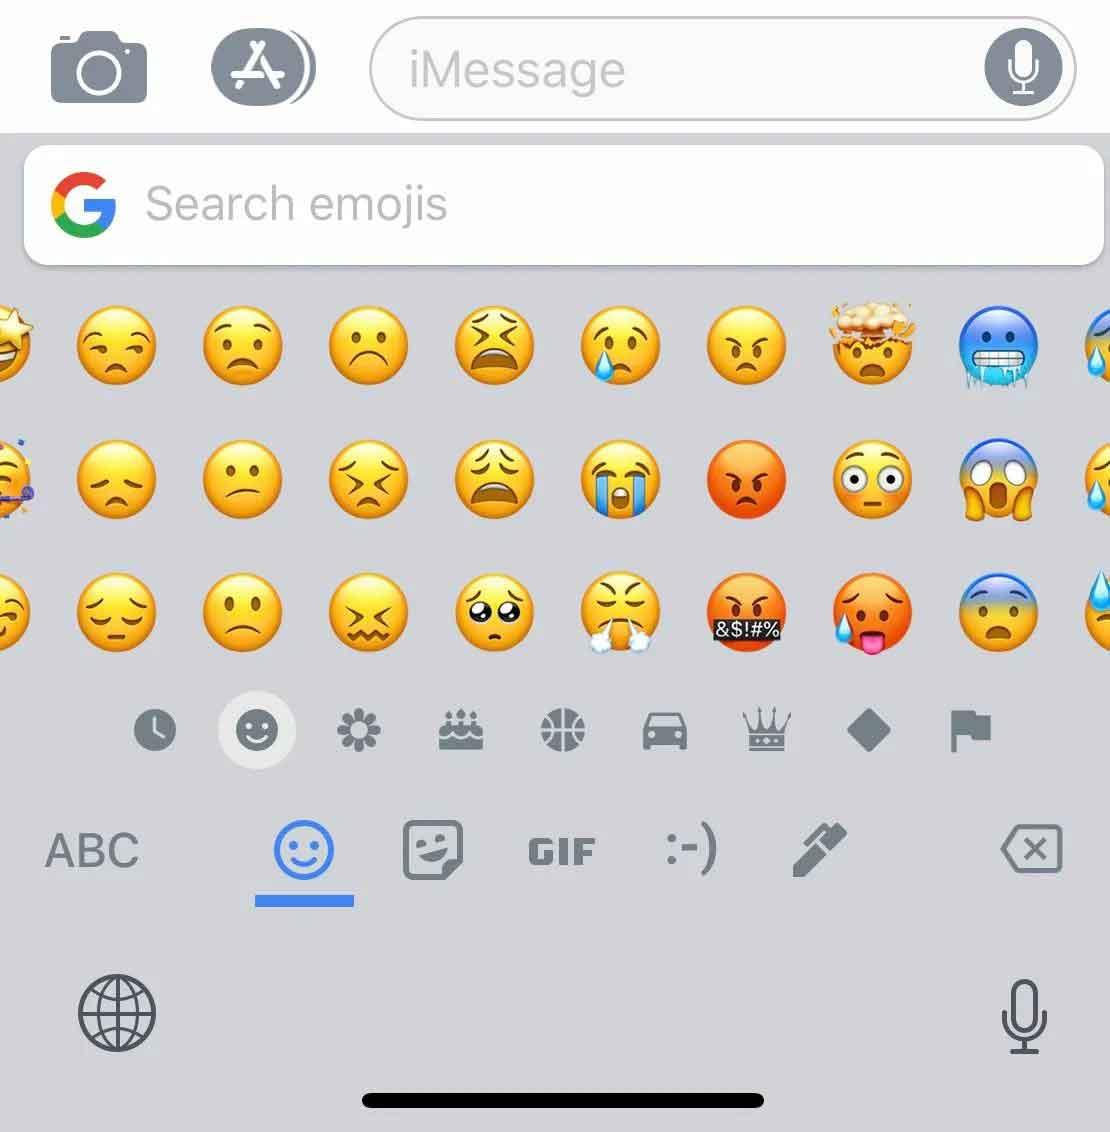 Клавиатура Emoji